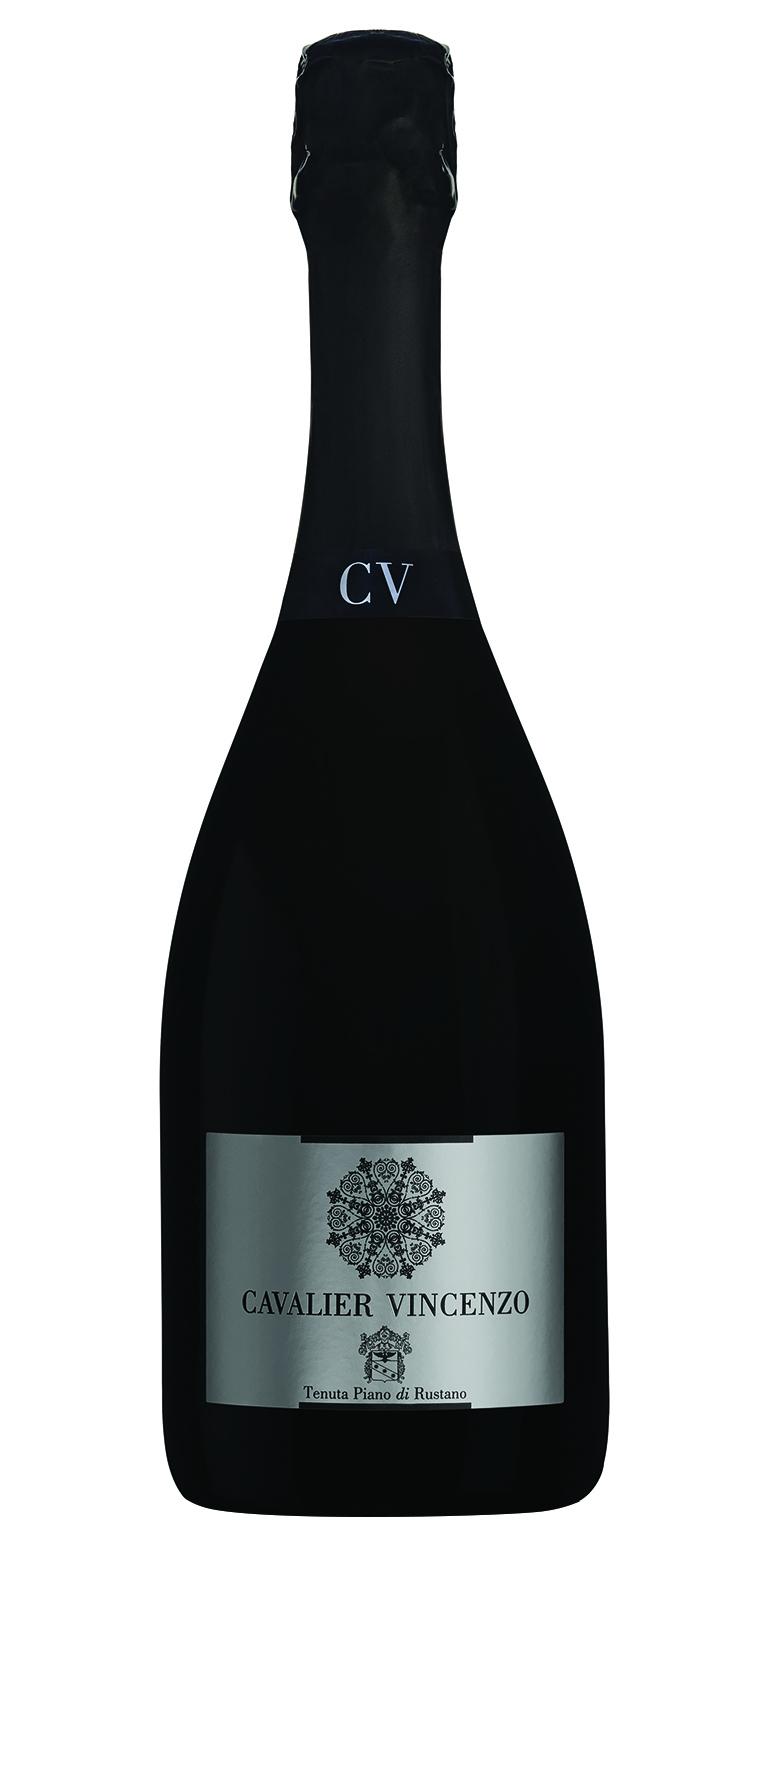 Cavalier Vincenzo 2018